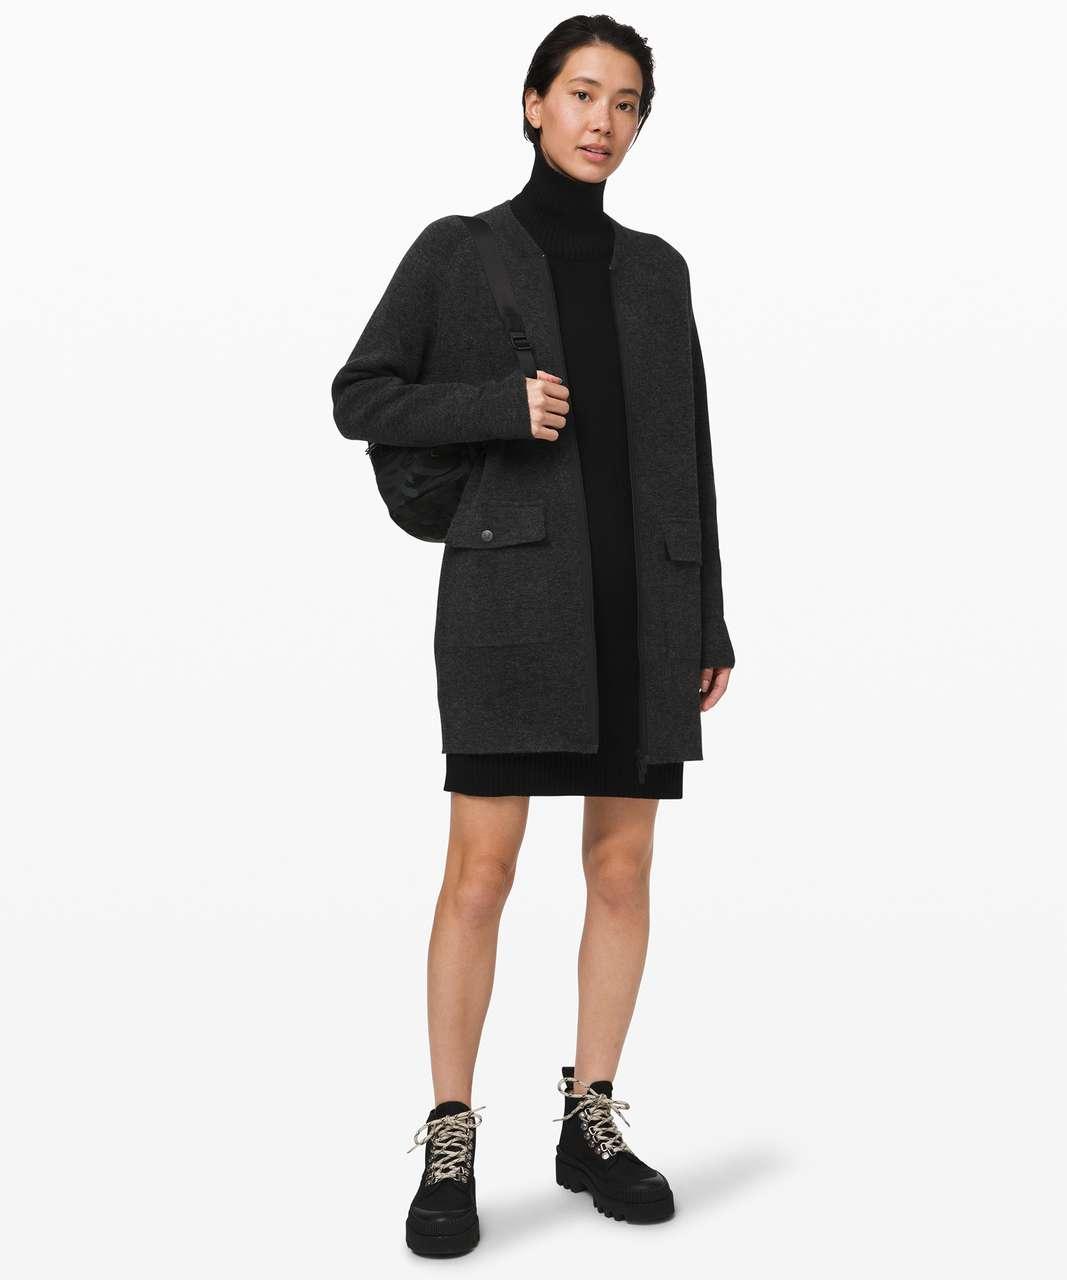 Lululemon Weekend Wander Jacket - Heathered Black / Dark Olive